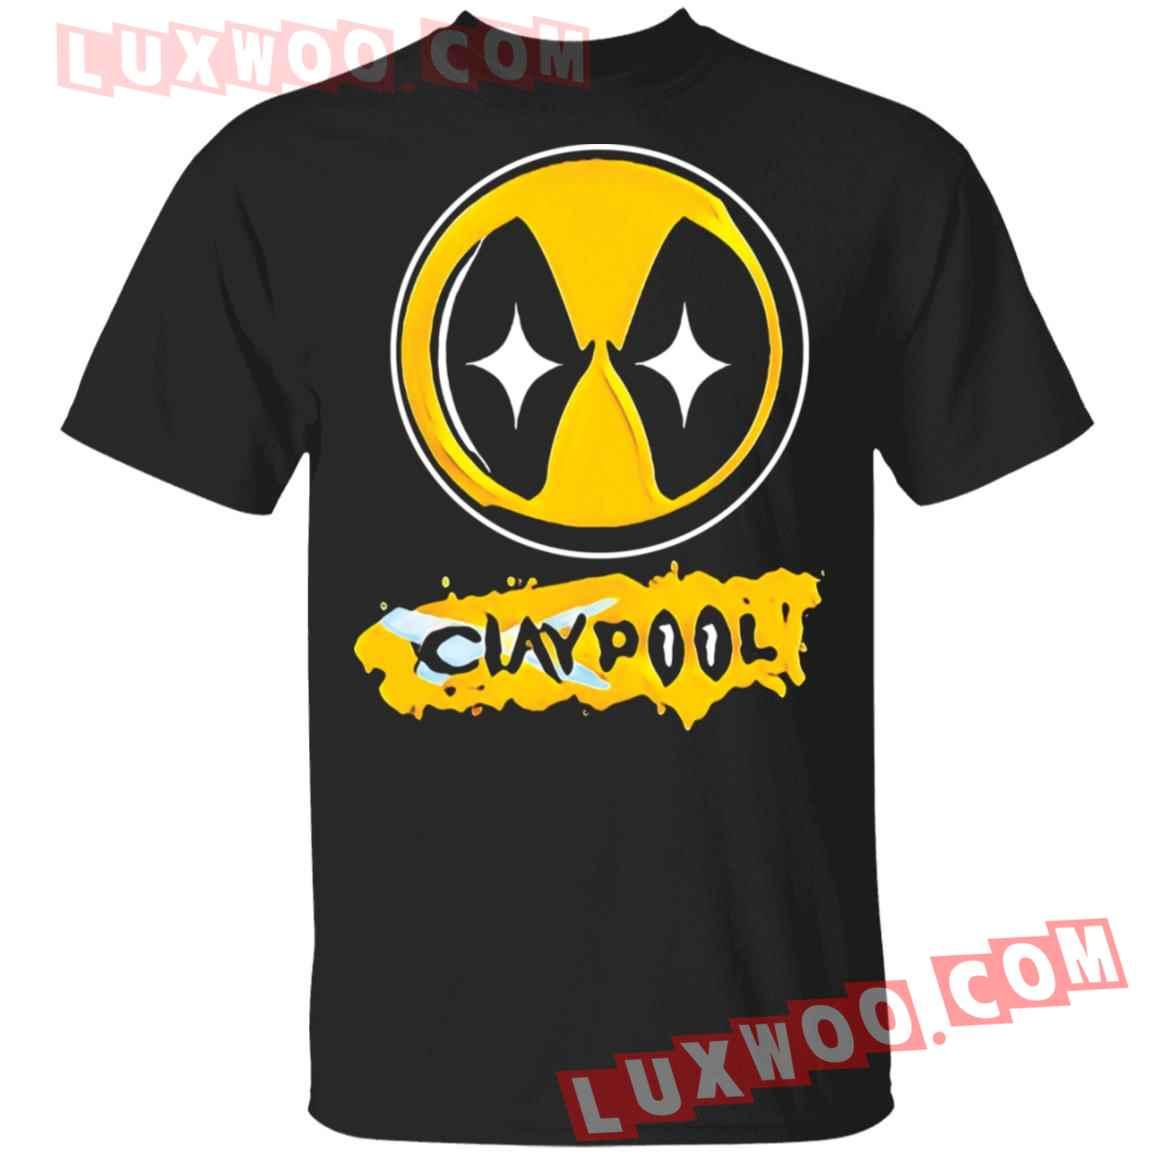 Deadpool Claypool Shirt